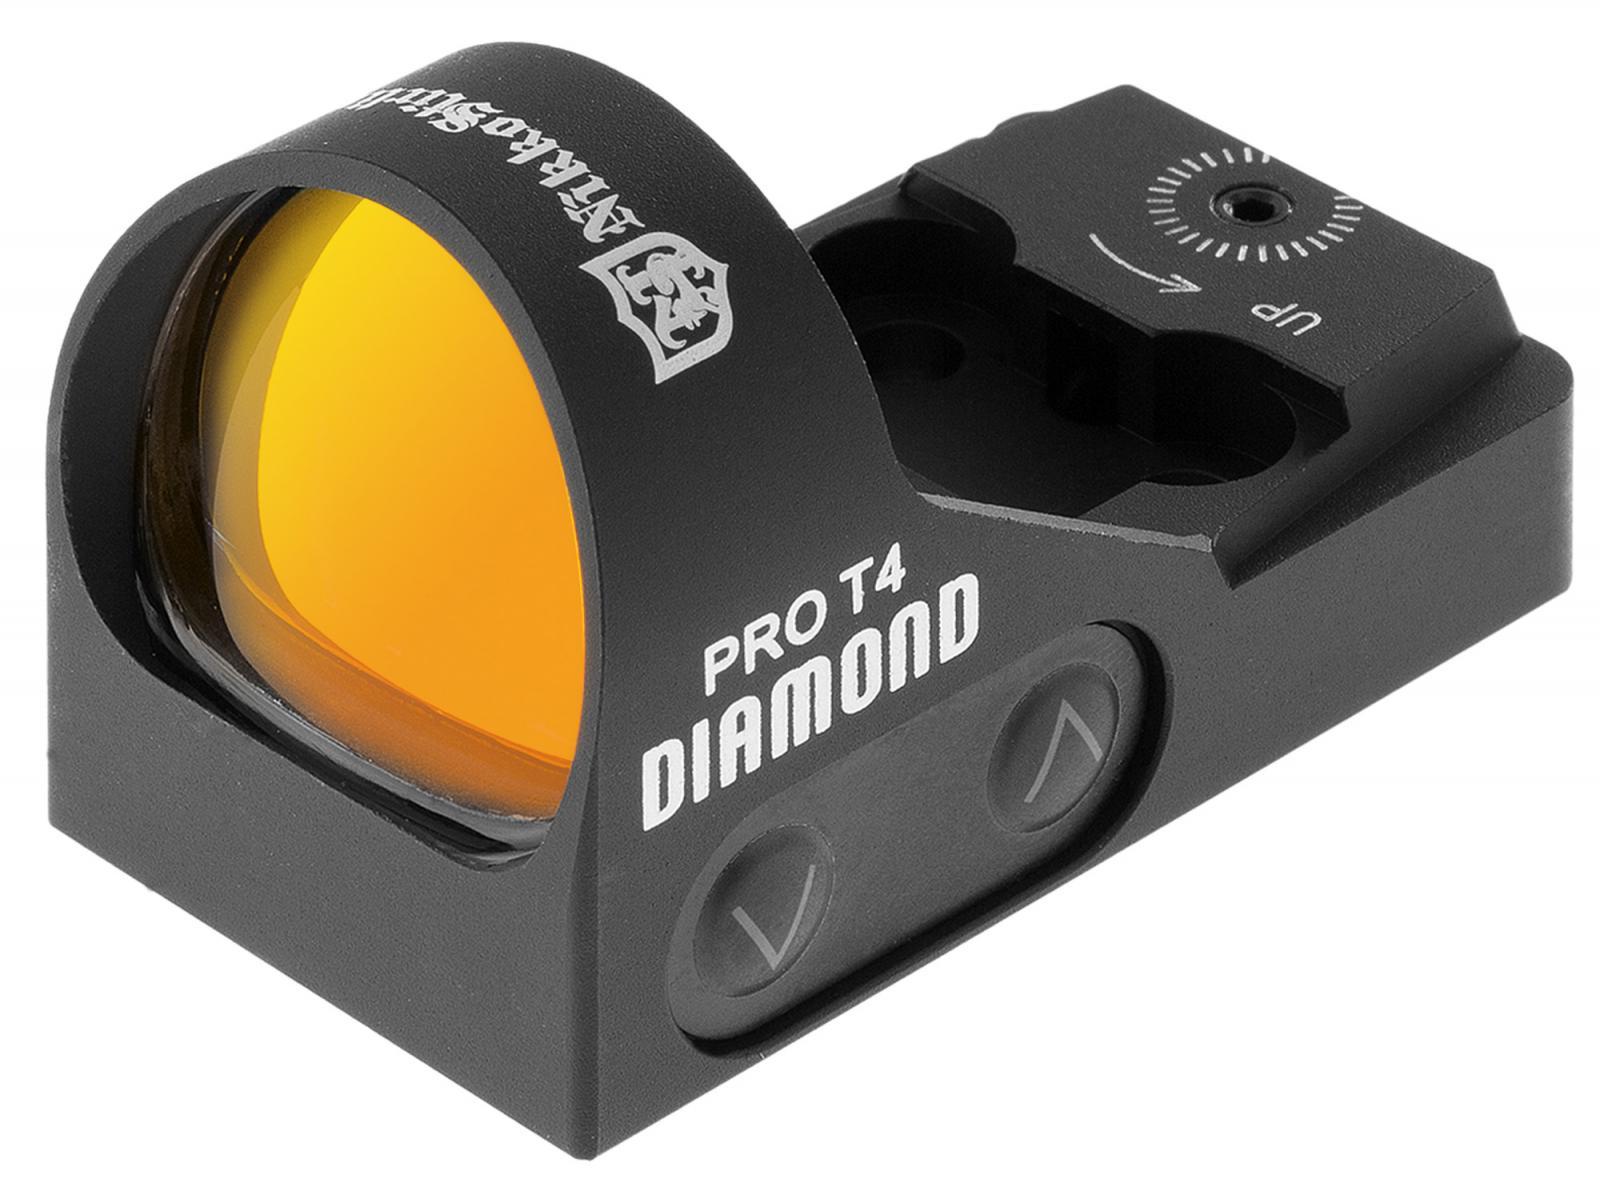 Viseur point rouge NIKKO STIRLING Pro T4 Diamond